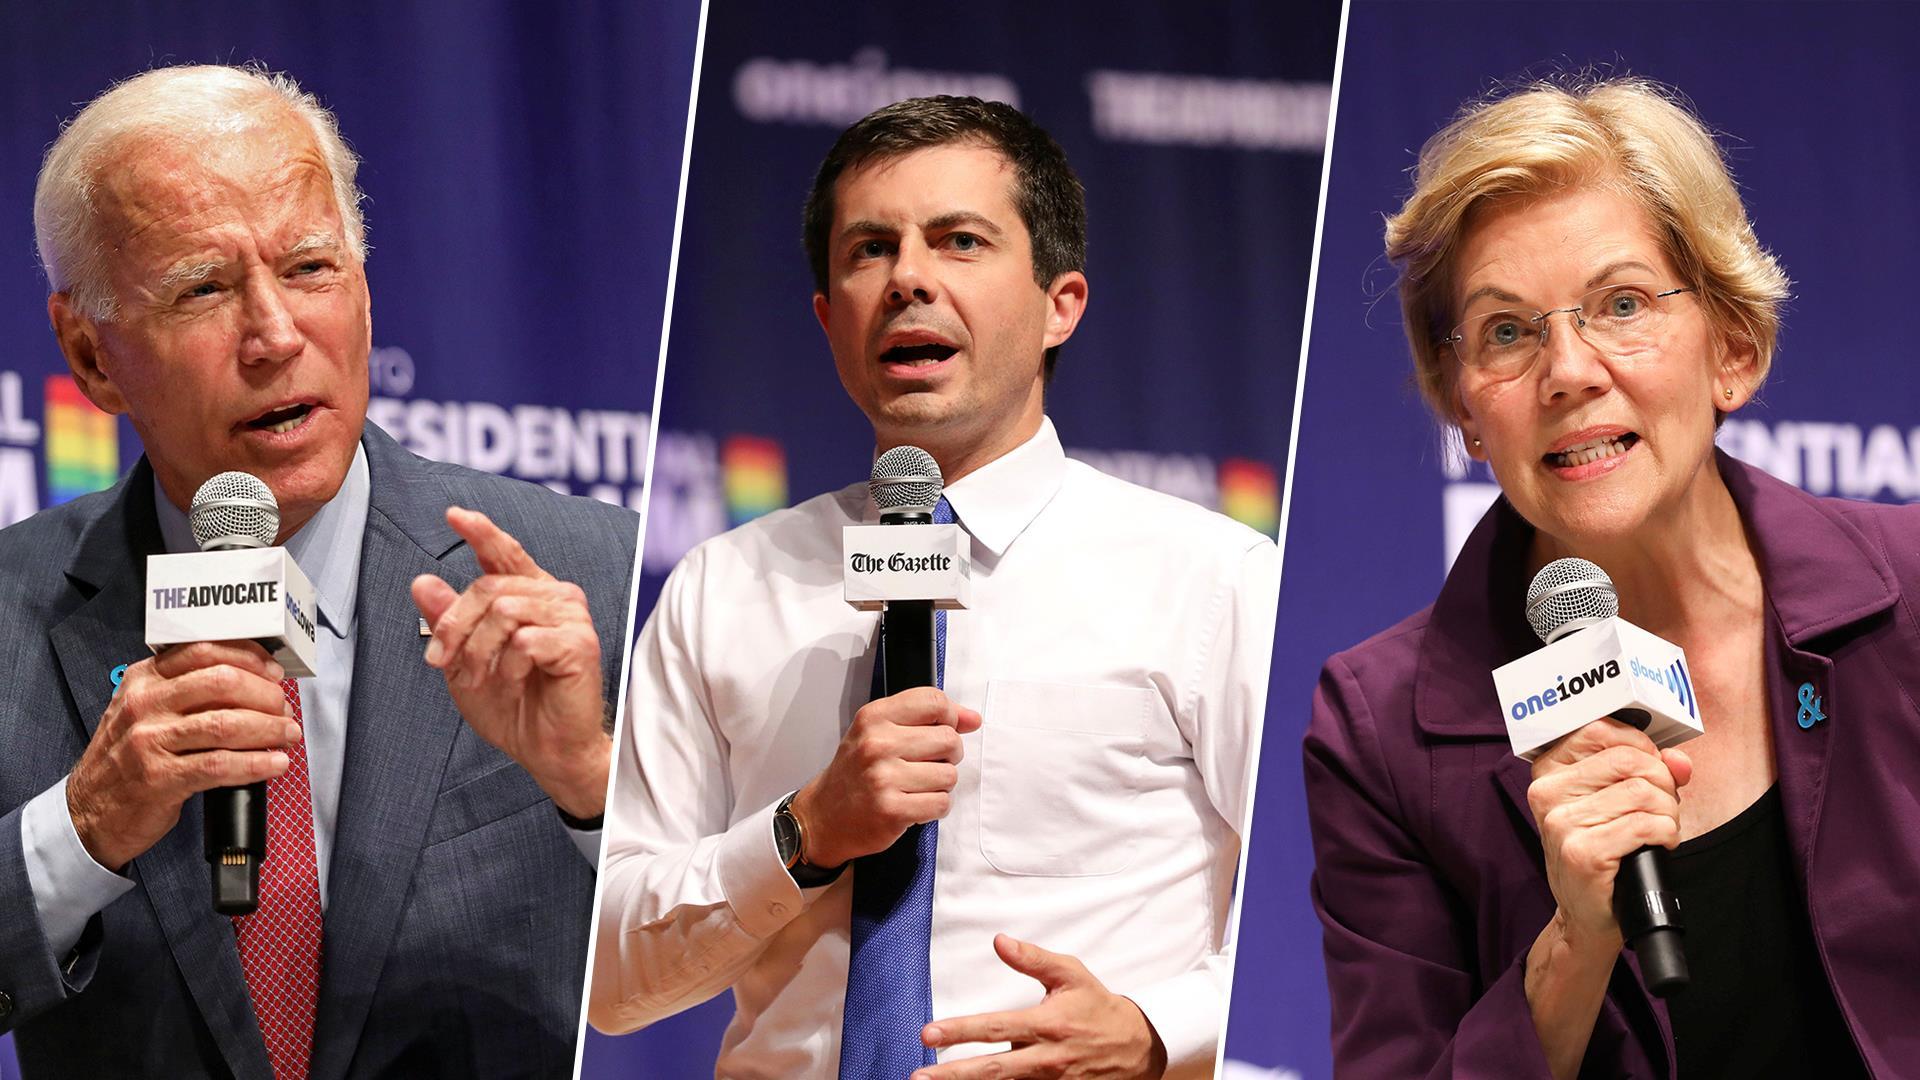 Democratic 2020 hopefuls tout their pride at Iowa LGBTQ forum